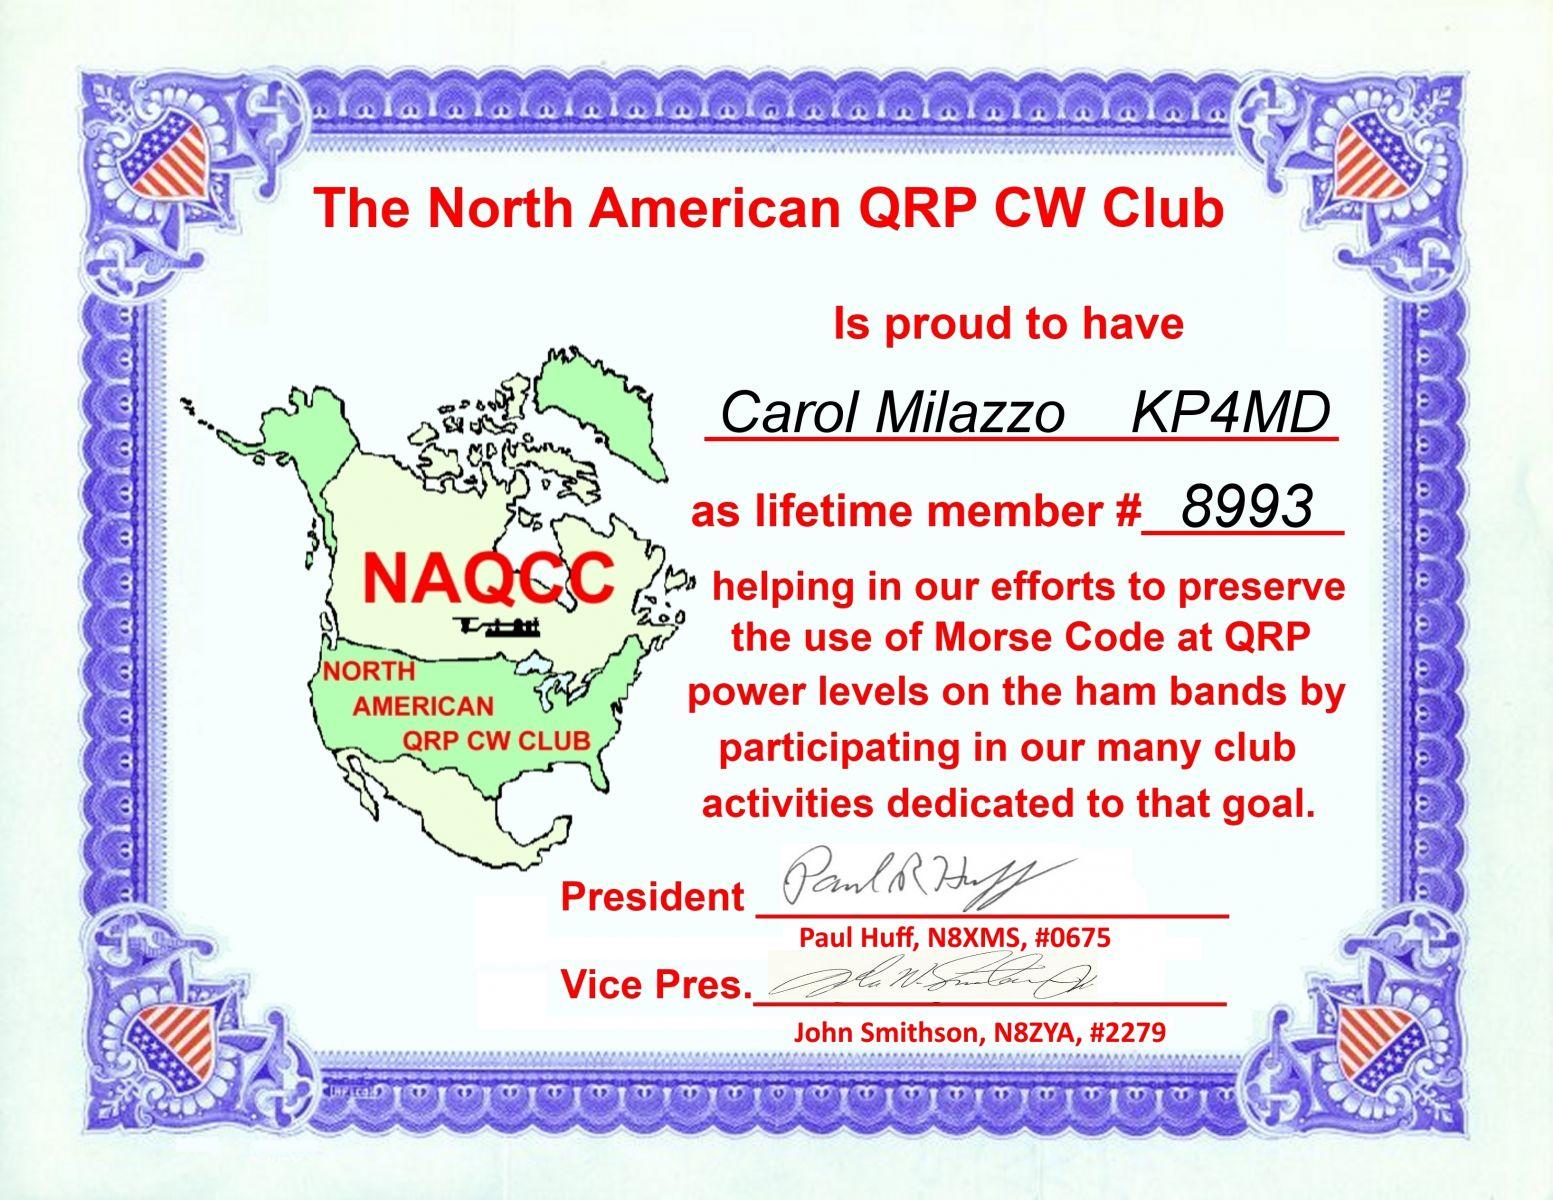 North American QRP CW Club #8993